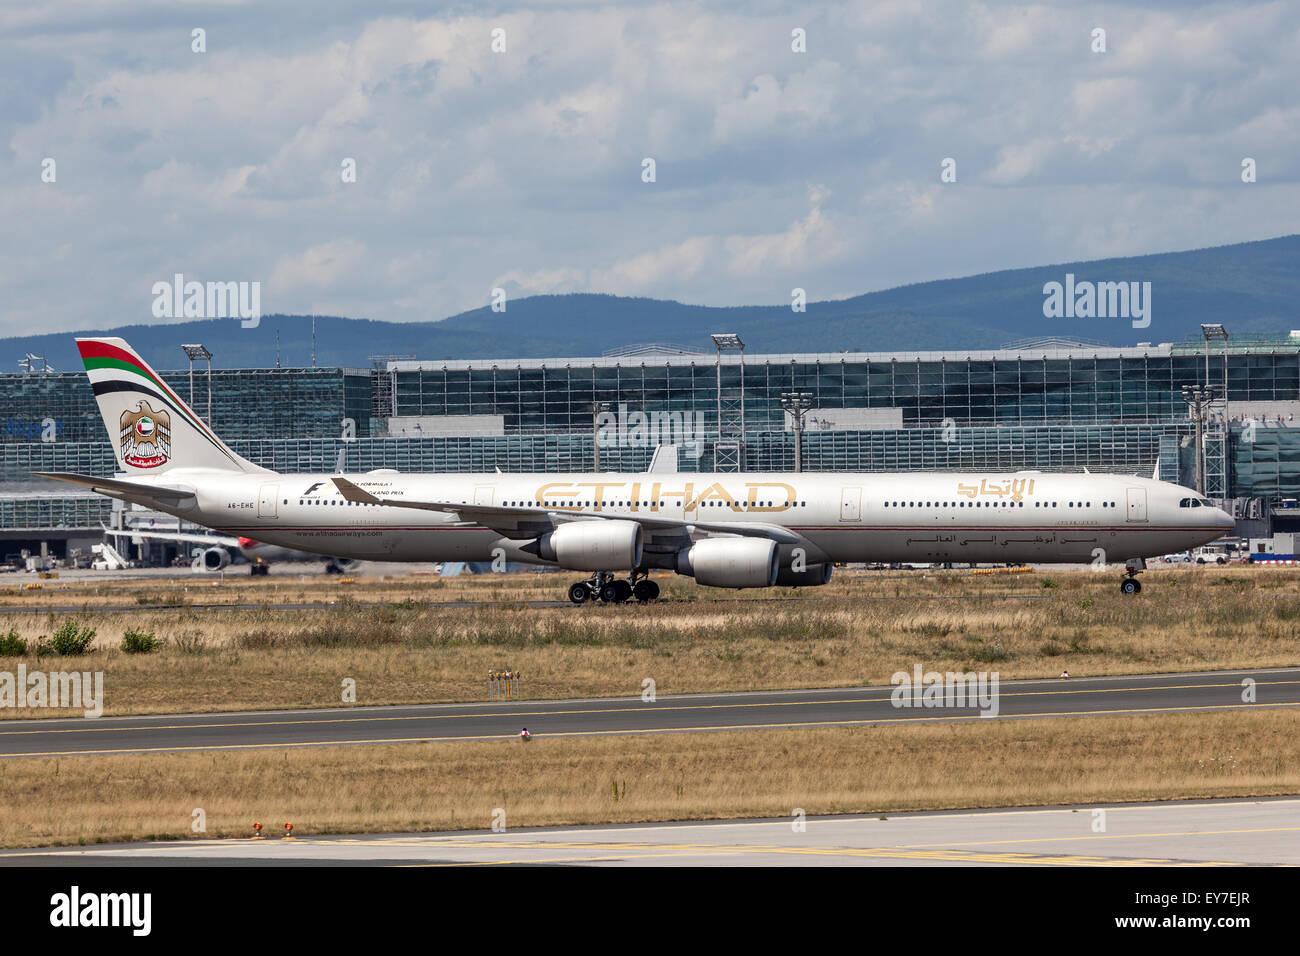 Etihad Airways Airbus A340 at the Frankfurt International Airport - Stock Image